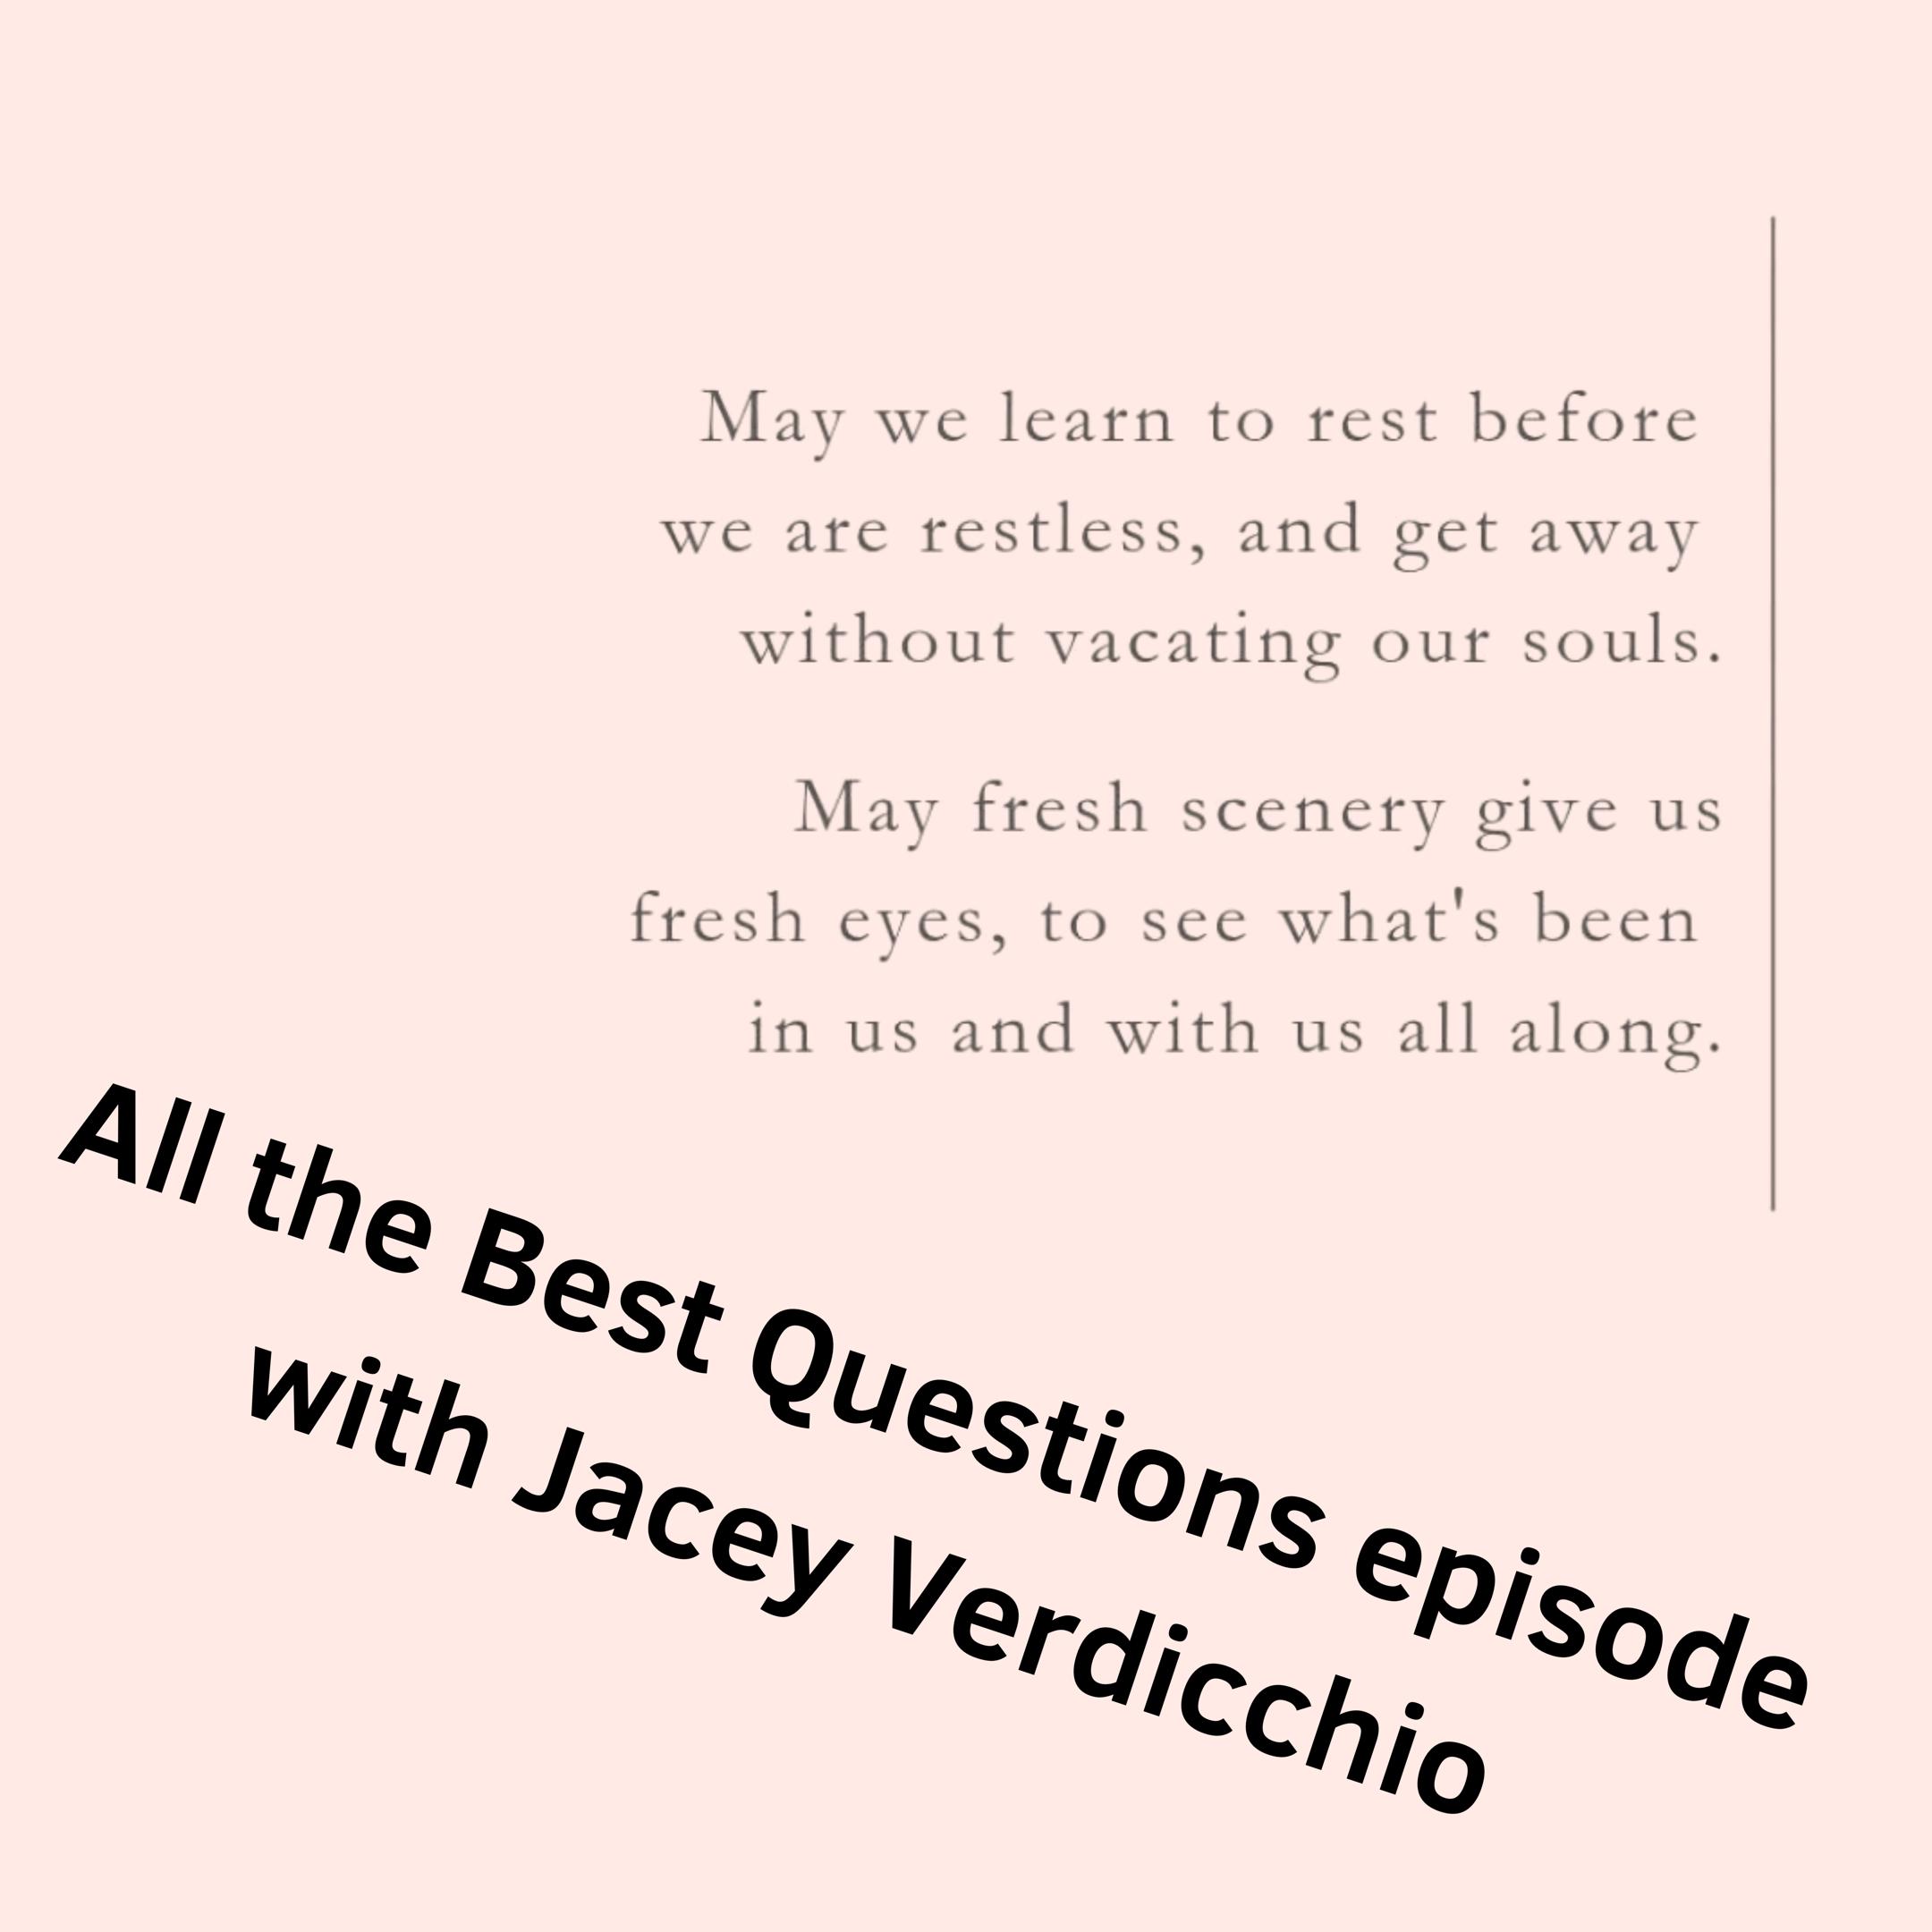 some FAQ's with Jacey Verdicchio @jaceyverdiccio -